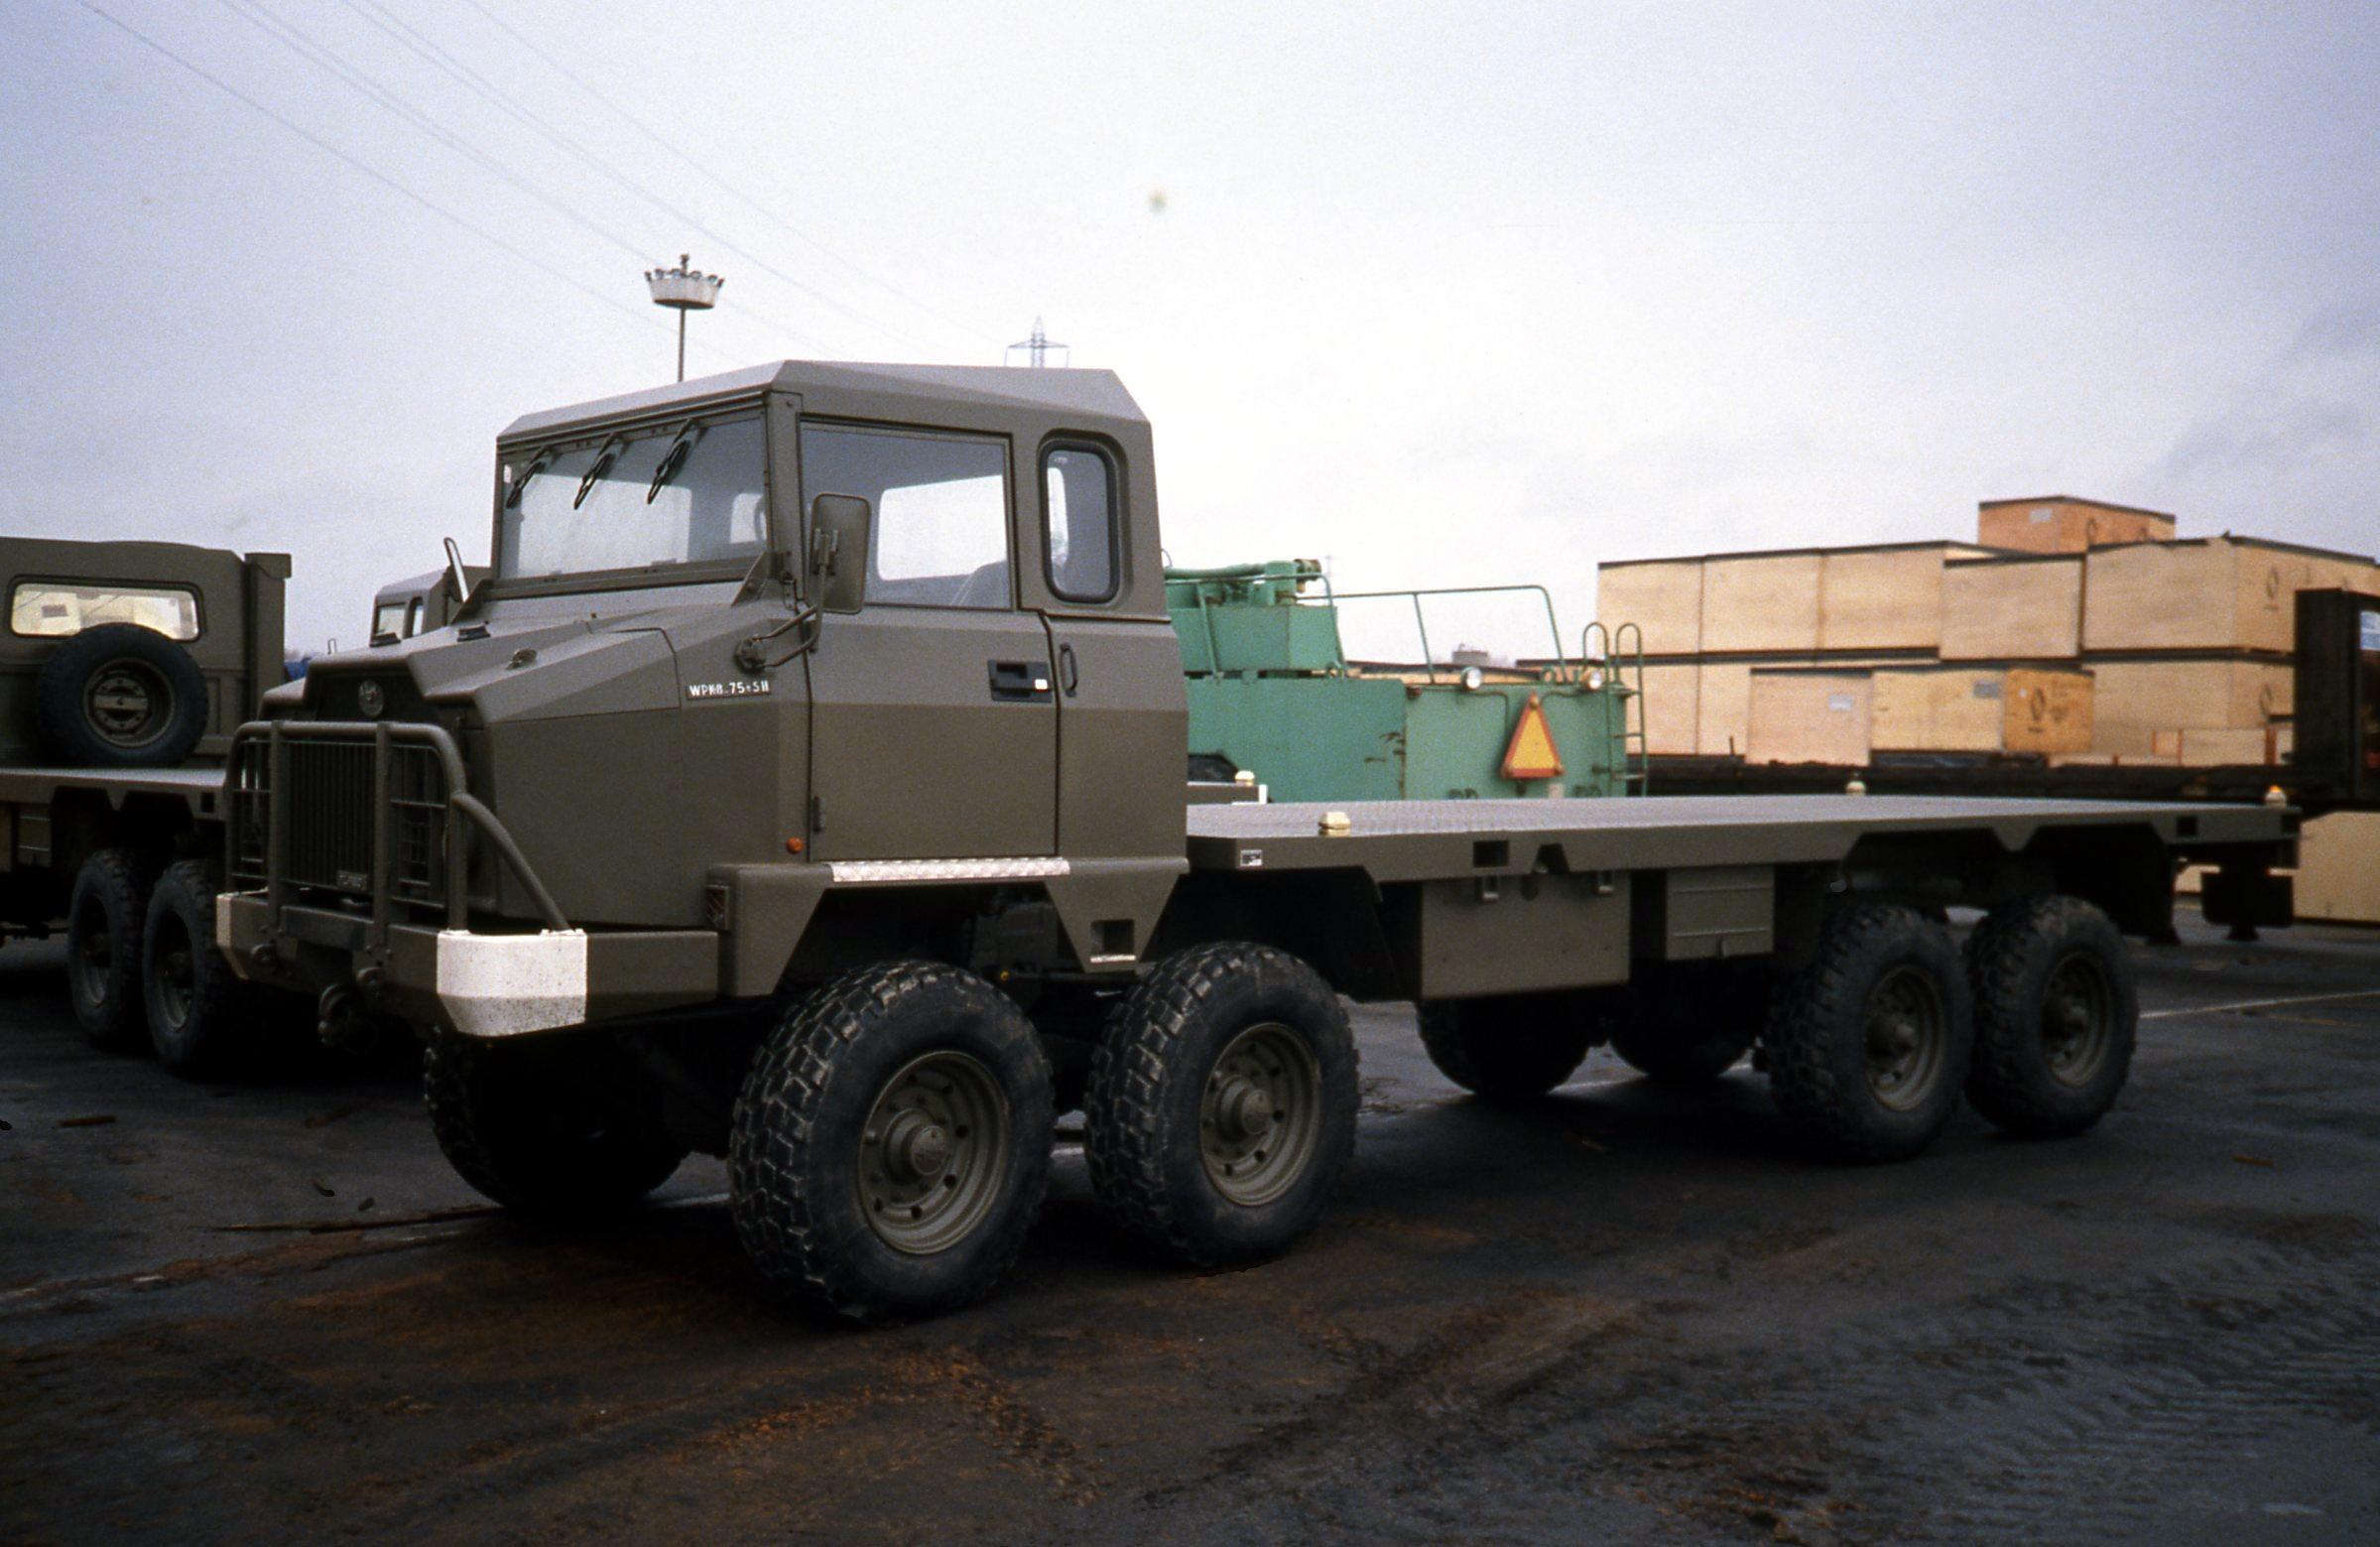 Photos - Logistique et Camions / Logistics and Trucks - Page 6 34096094803_b55a42e814_o